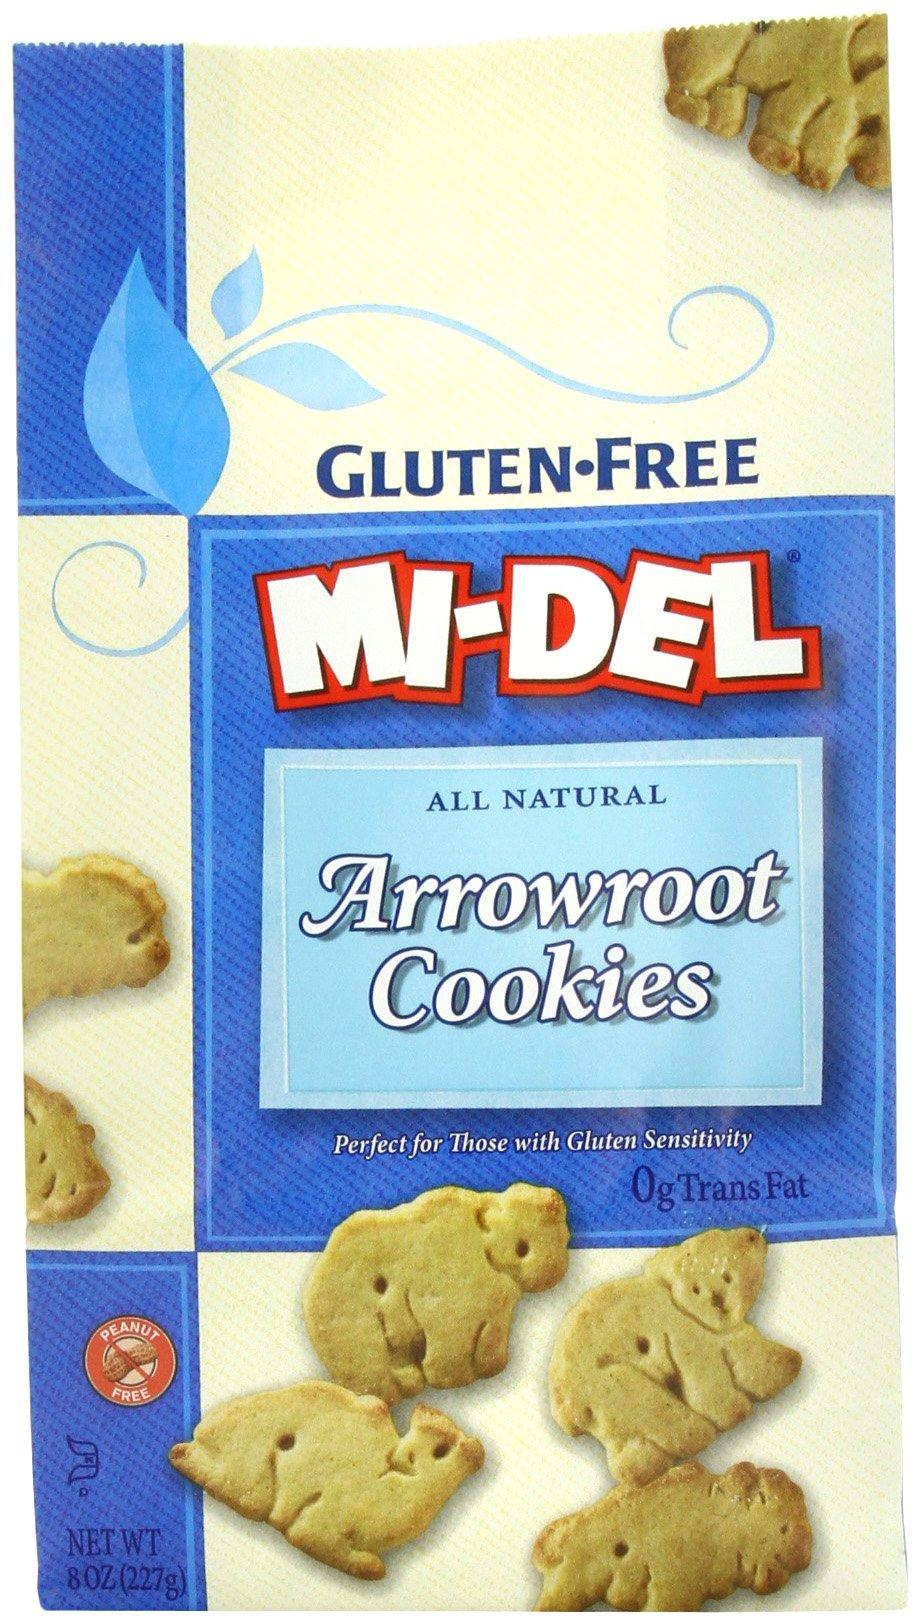 Mi-Del Gluten-Free Cookies, Arrowroot, 8 Ounce (Pack of 12) by Mi-Del